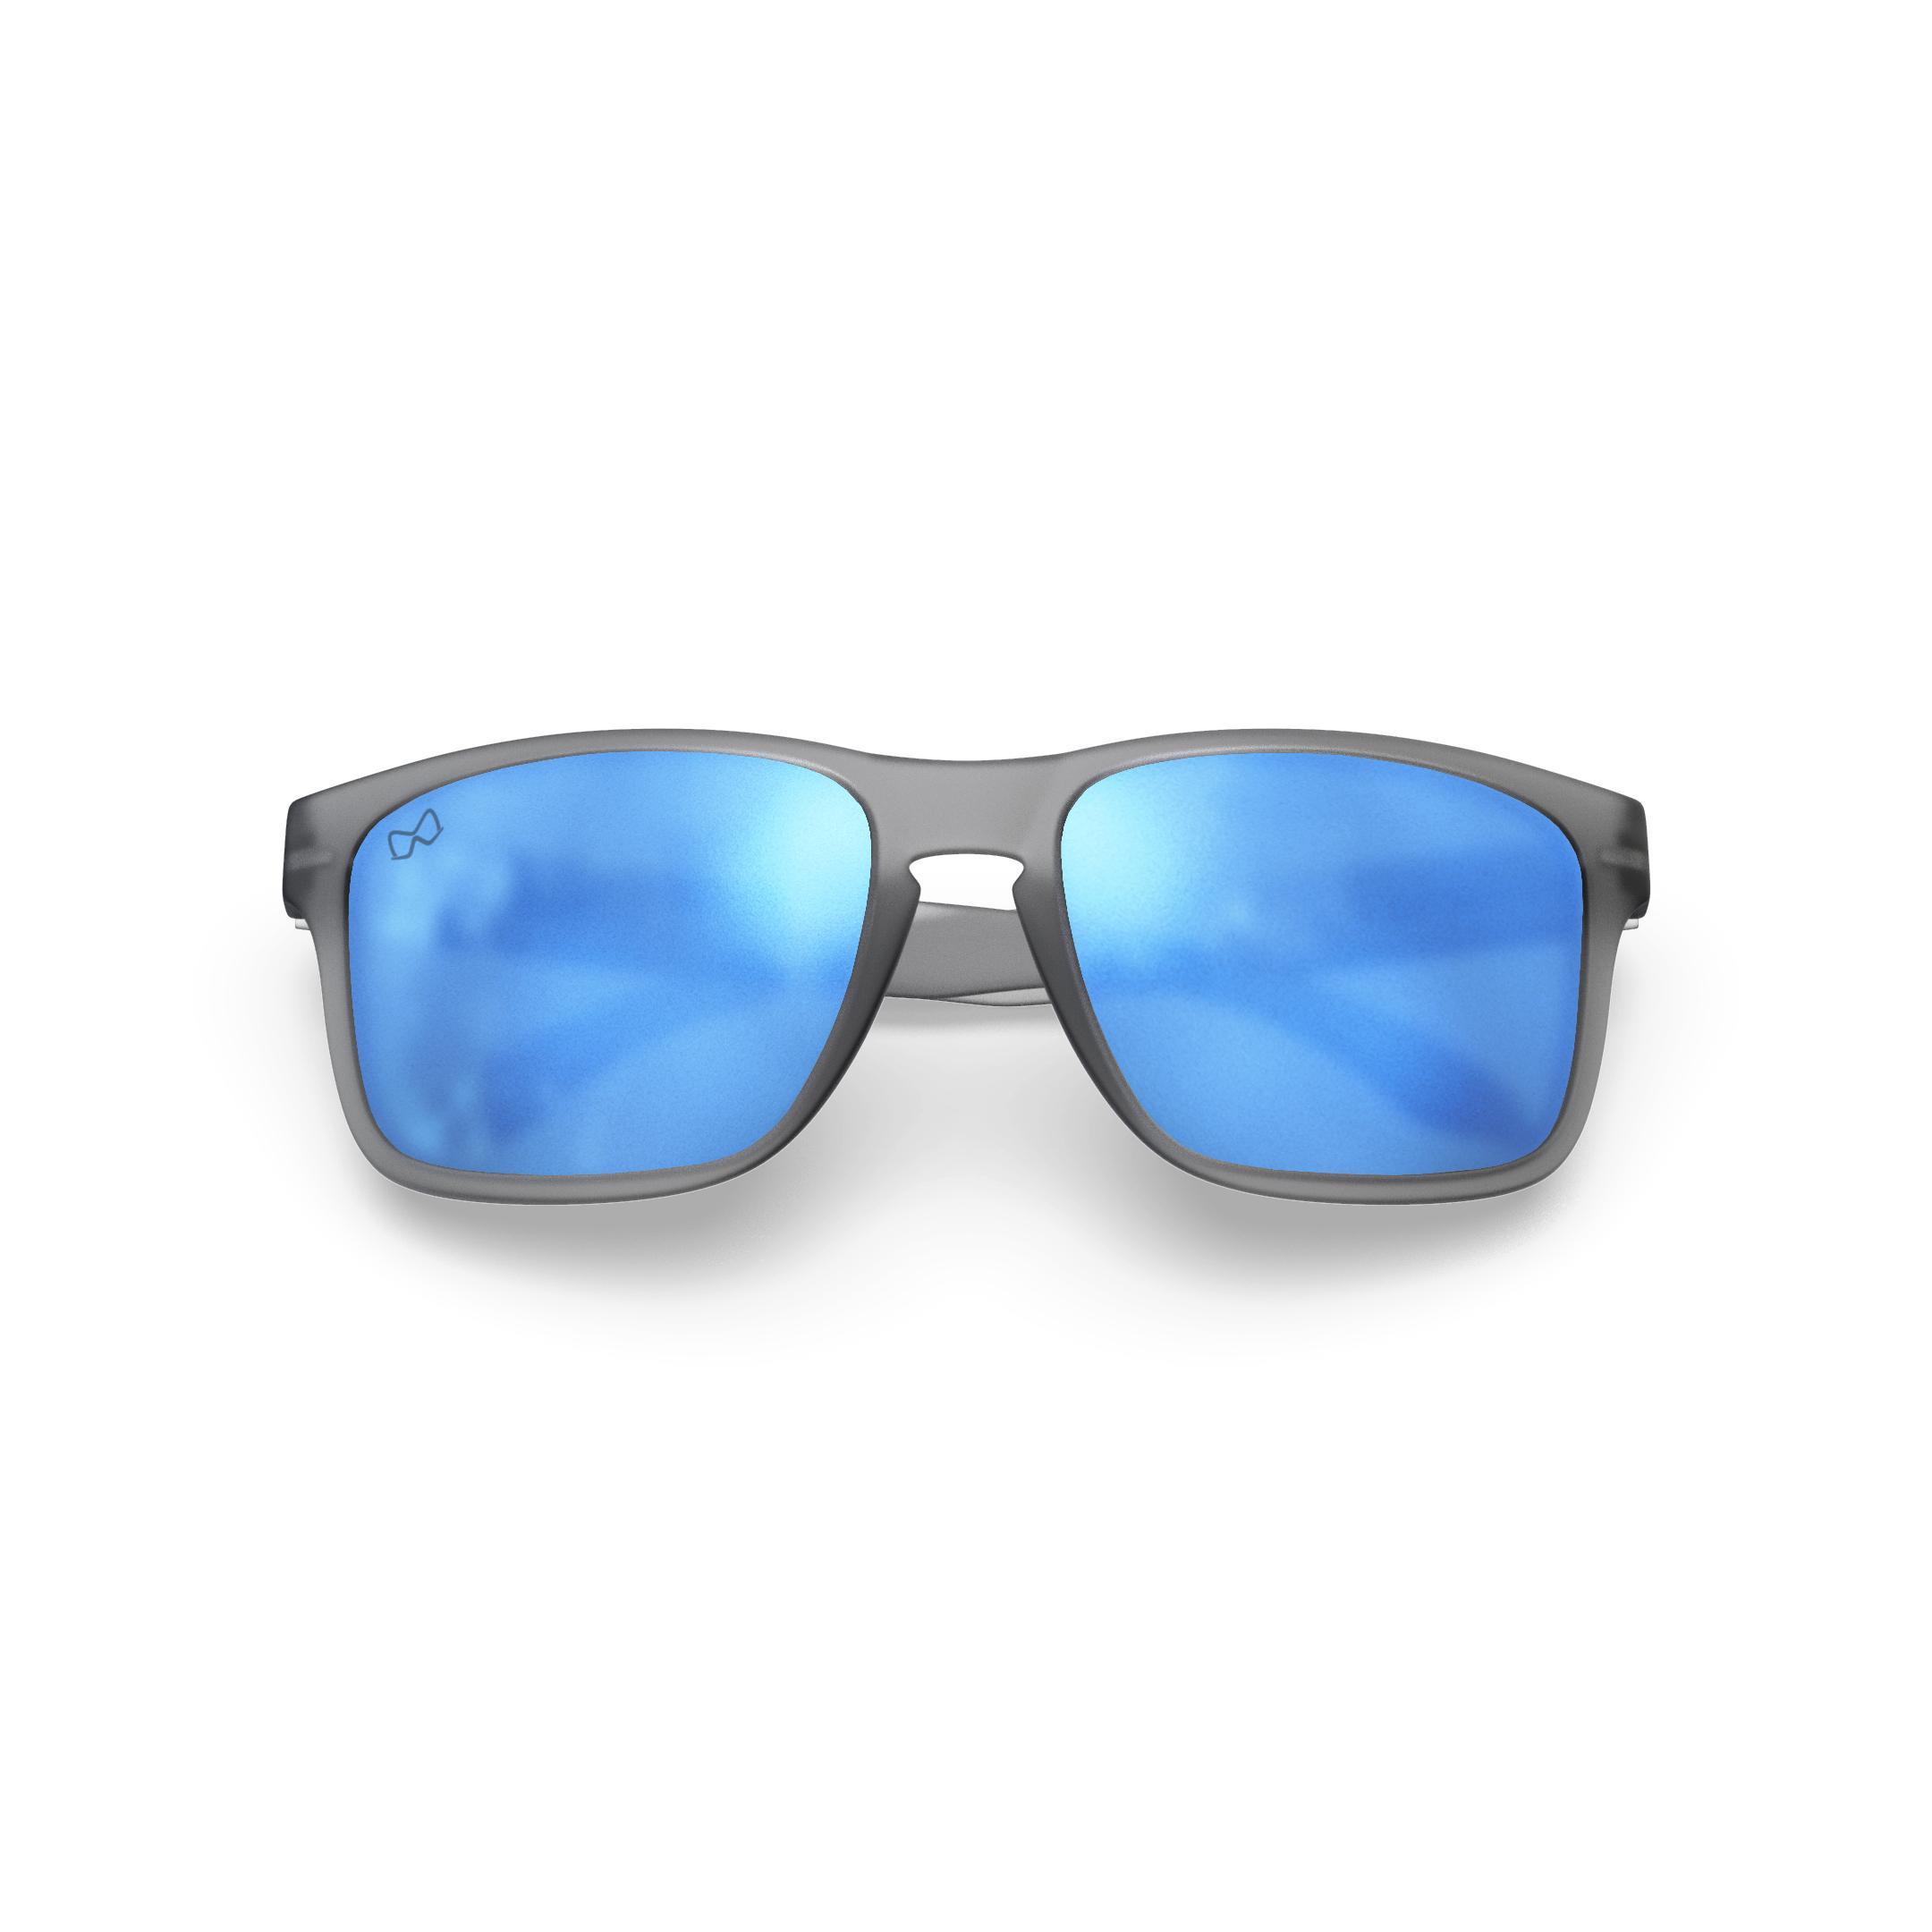 Mariener-Melange-Makan-Frozen-Grey-Matte-Reflective-Sky-Adult-Sunglasses-Zonnebril-Mat-Reflecterend-Volwassenen-Folded